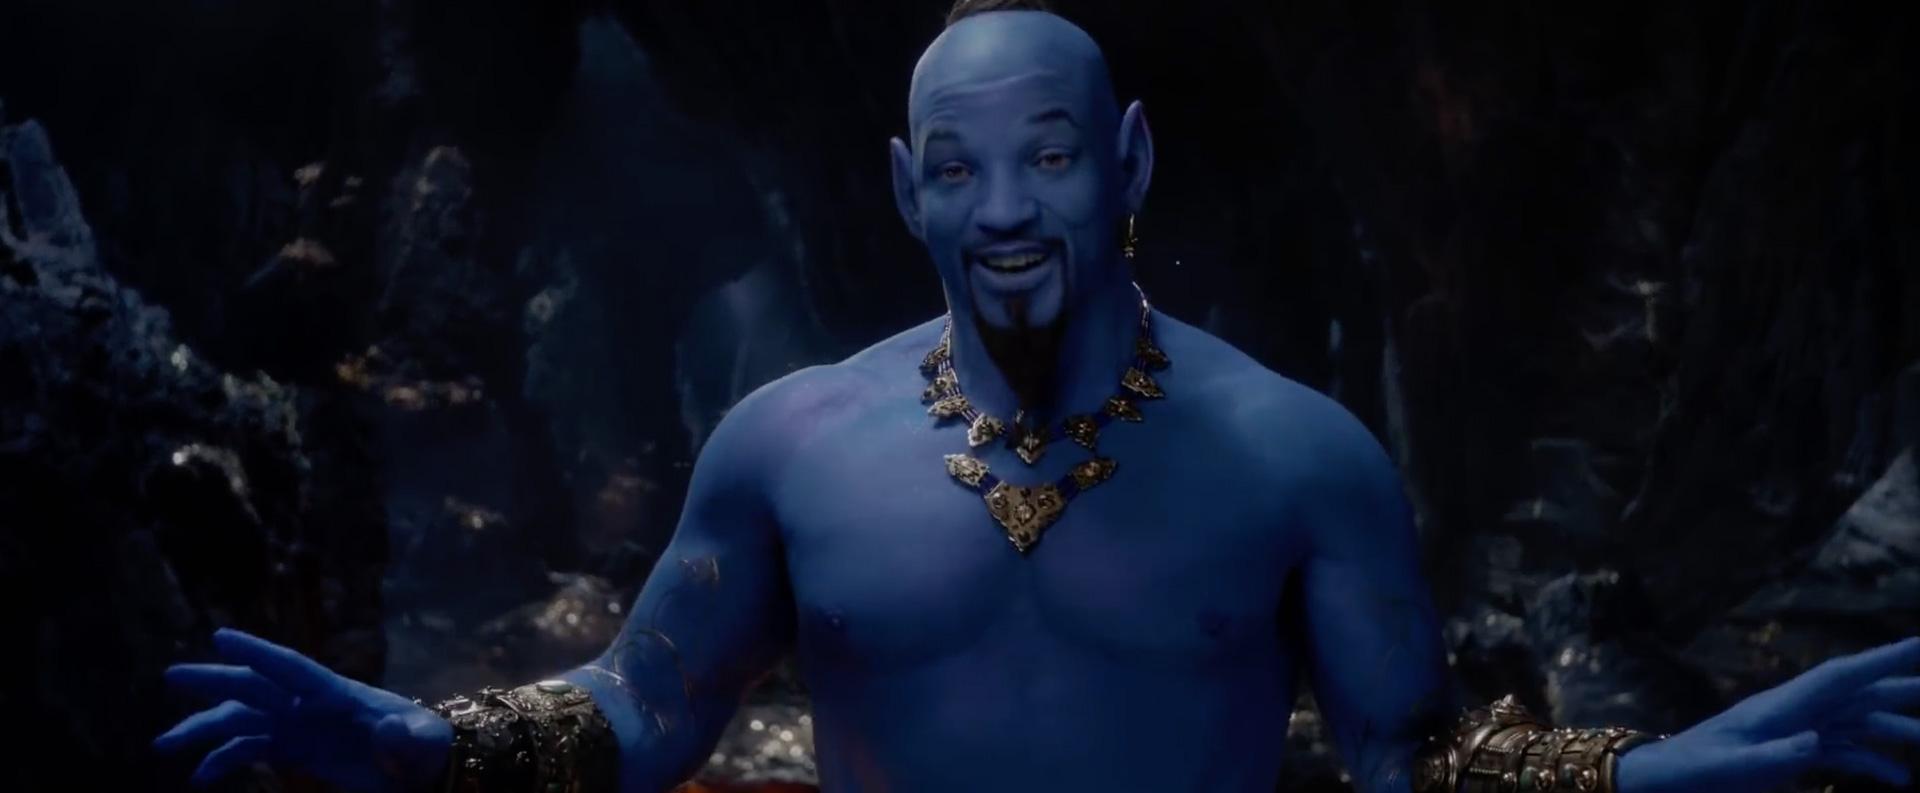 Aladdin The Art Of Vfxthe Art Of Vfx